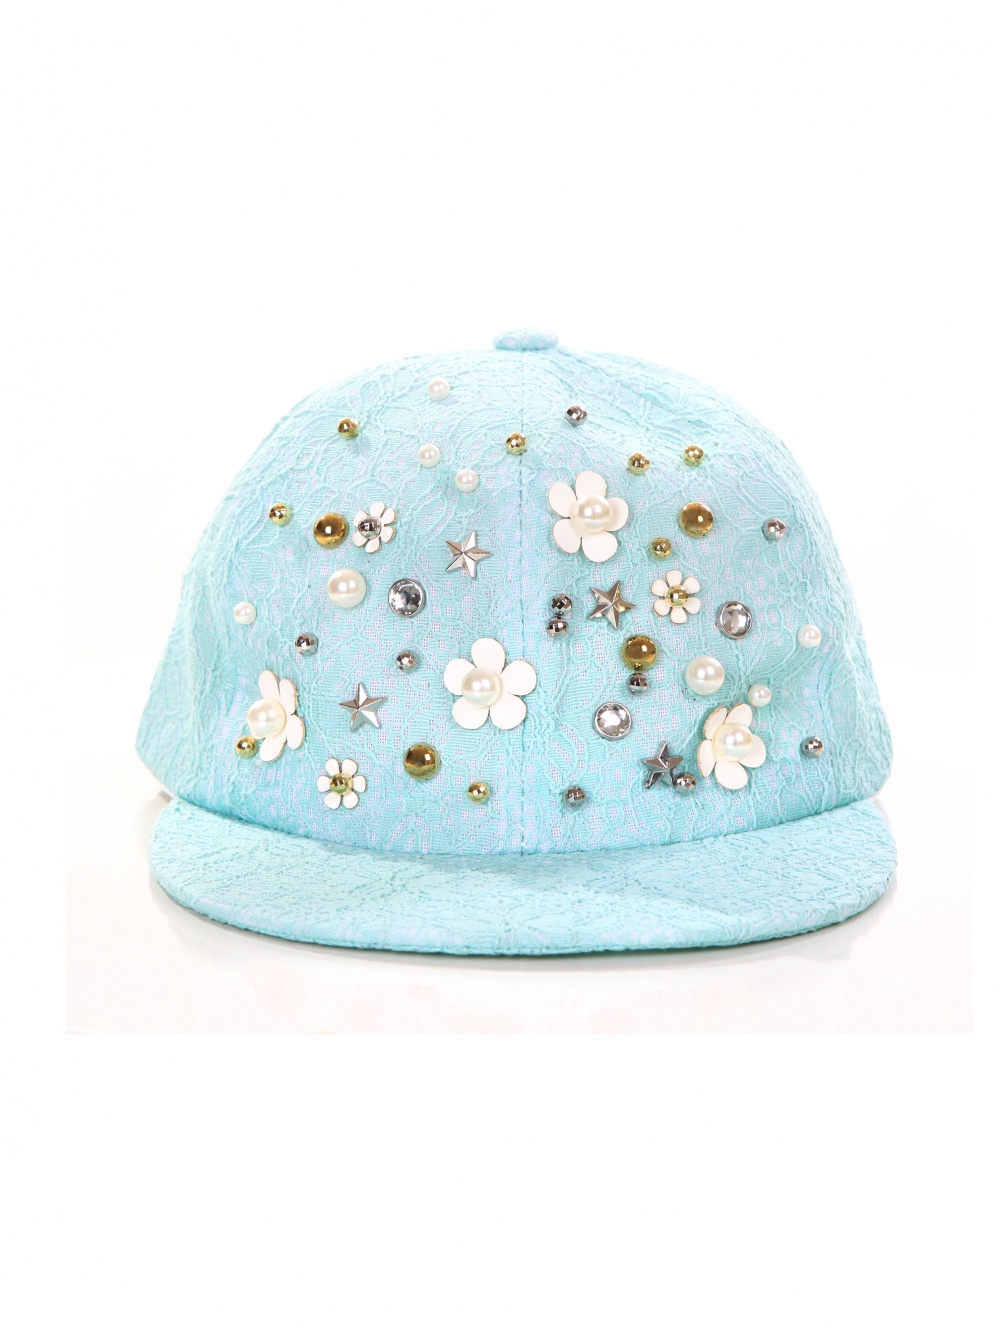 Кружевная кепка StyleTrack, free size